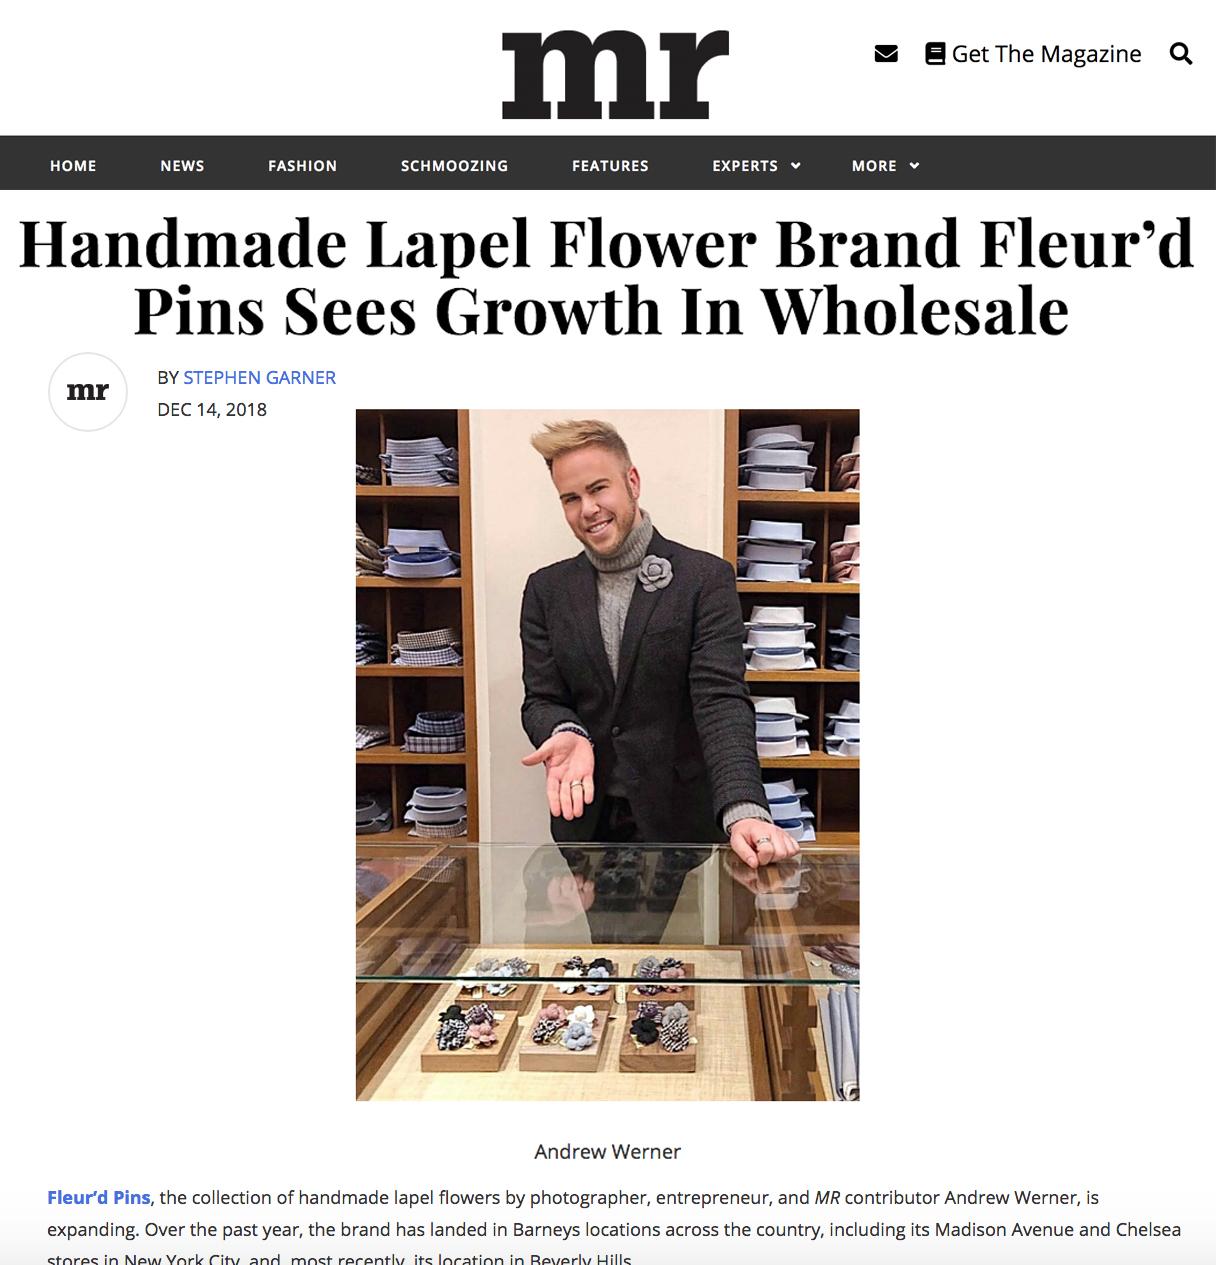 MR Magazine - Handmade Lapel Flower Brand Fleur'd Pins Sees Growth In Wholesale